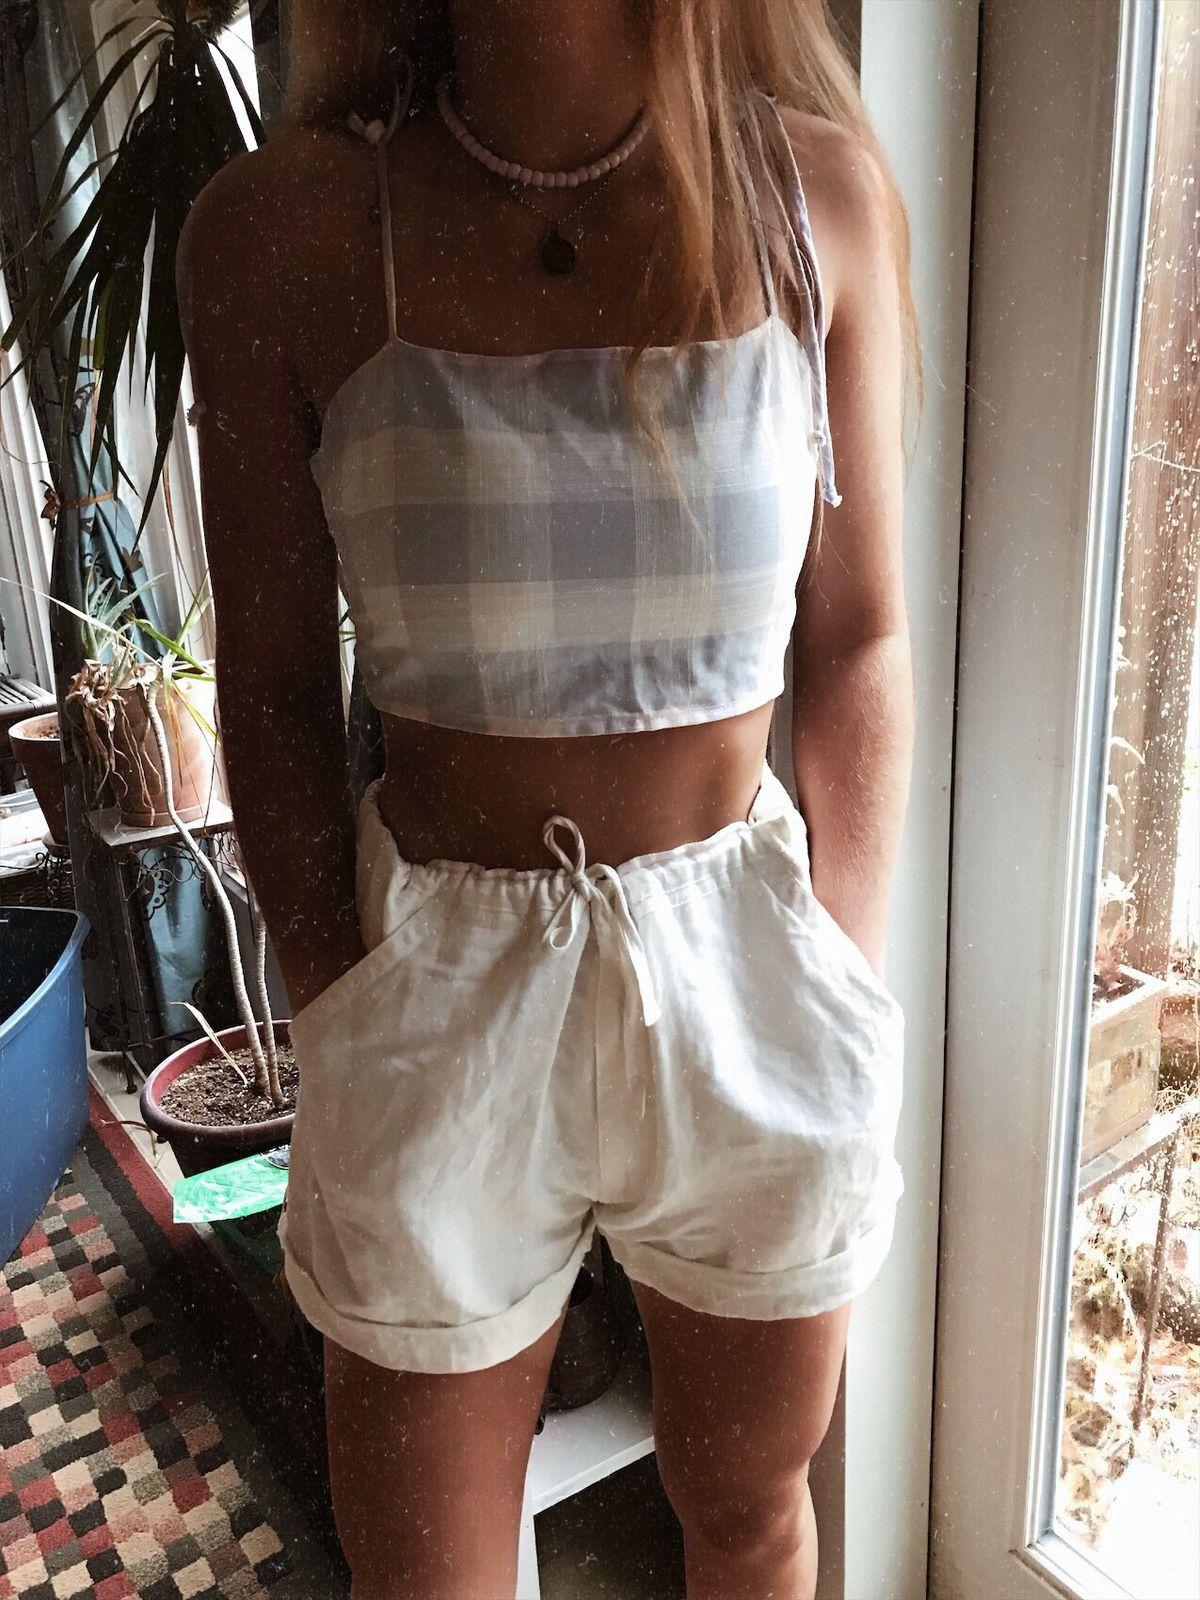 Нš™ðš'𝚗𝚝𝚎𝚛𝚎𝚜𝚝 Нš'𝚕𝚜𝚎𝚖𝚛𝚜 Summer Outfits Cute Outfits Fashion